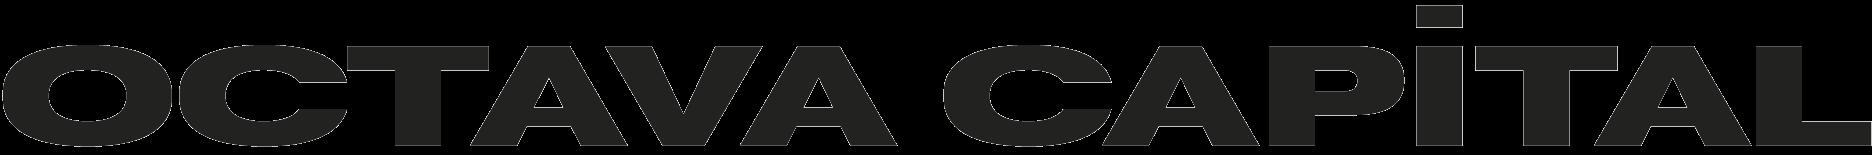 octavacapital